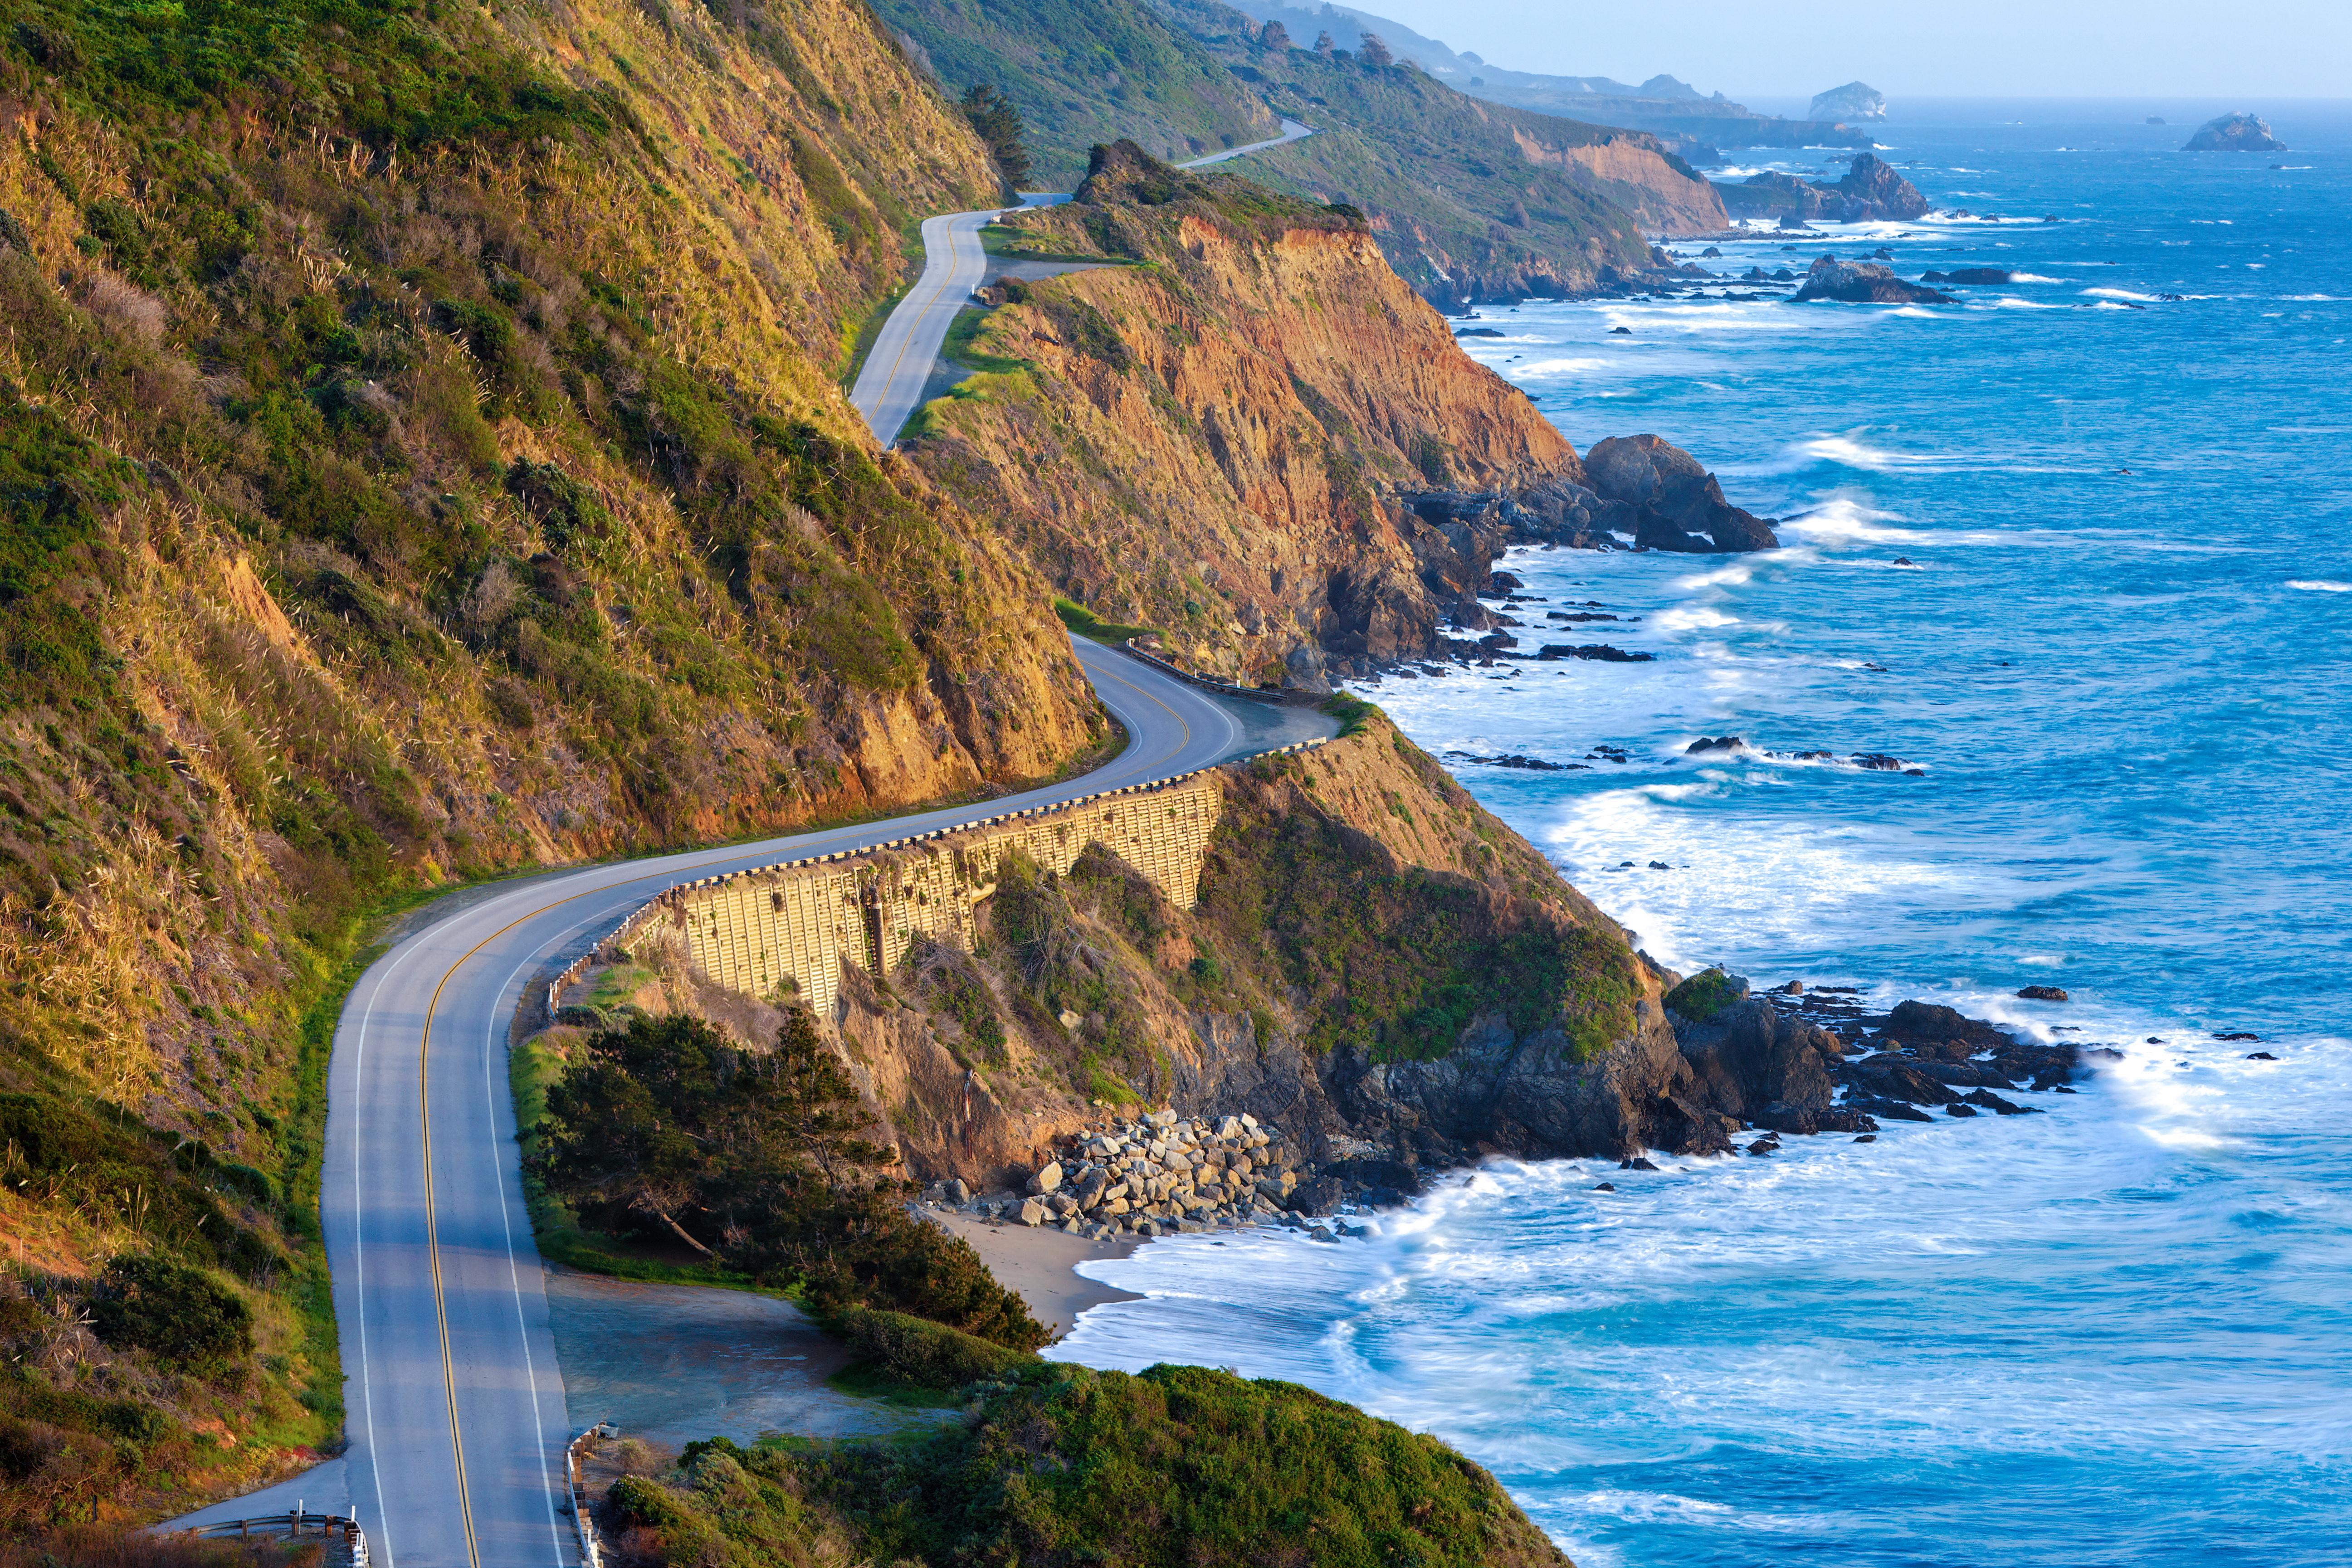 Coastal highway; luxury auto